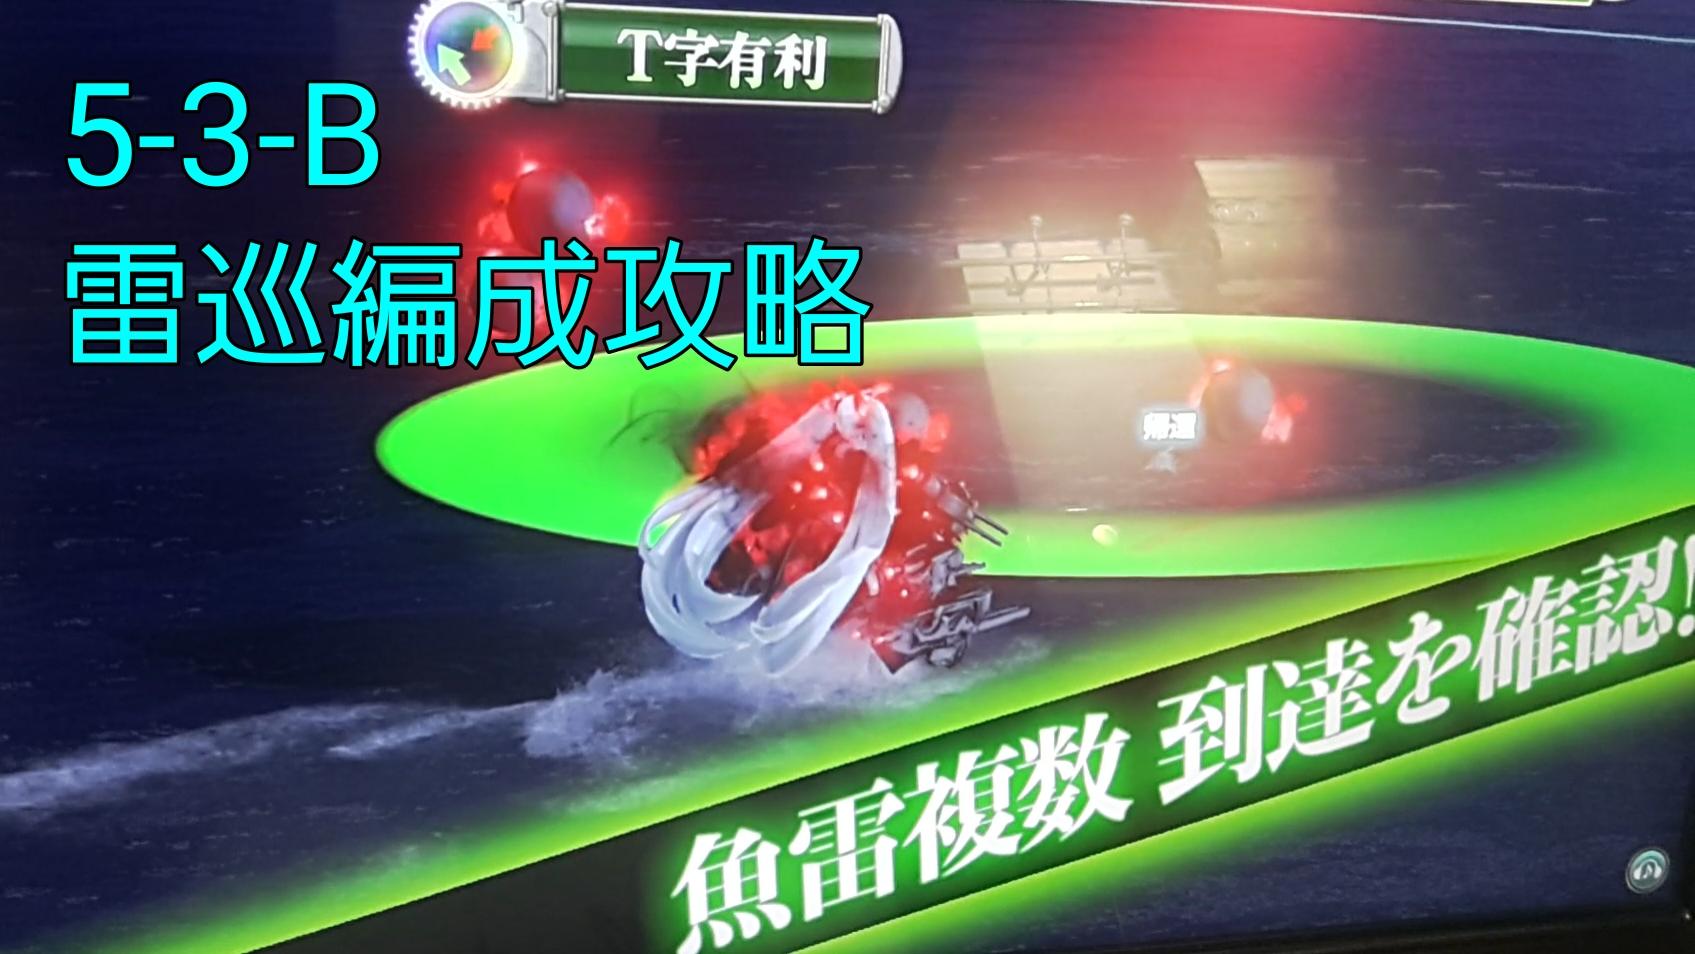 【AC】第一次サーモン沖海戦(5-3-B) 駆逐3雷巡3 プレイ動画